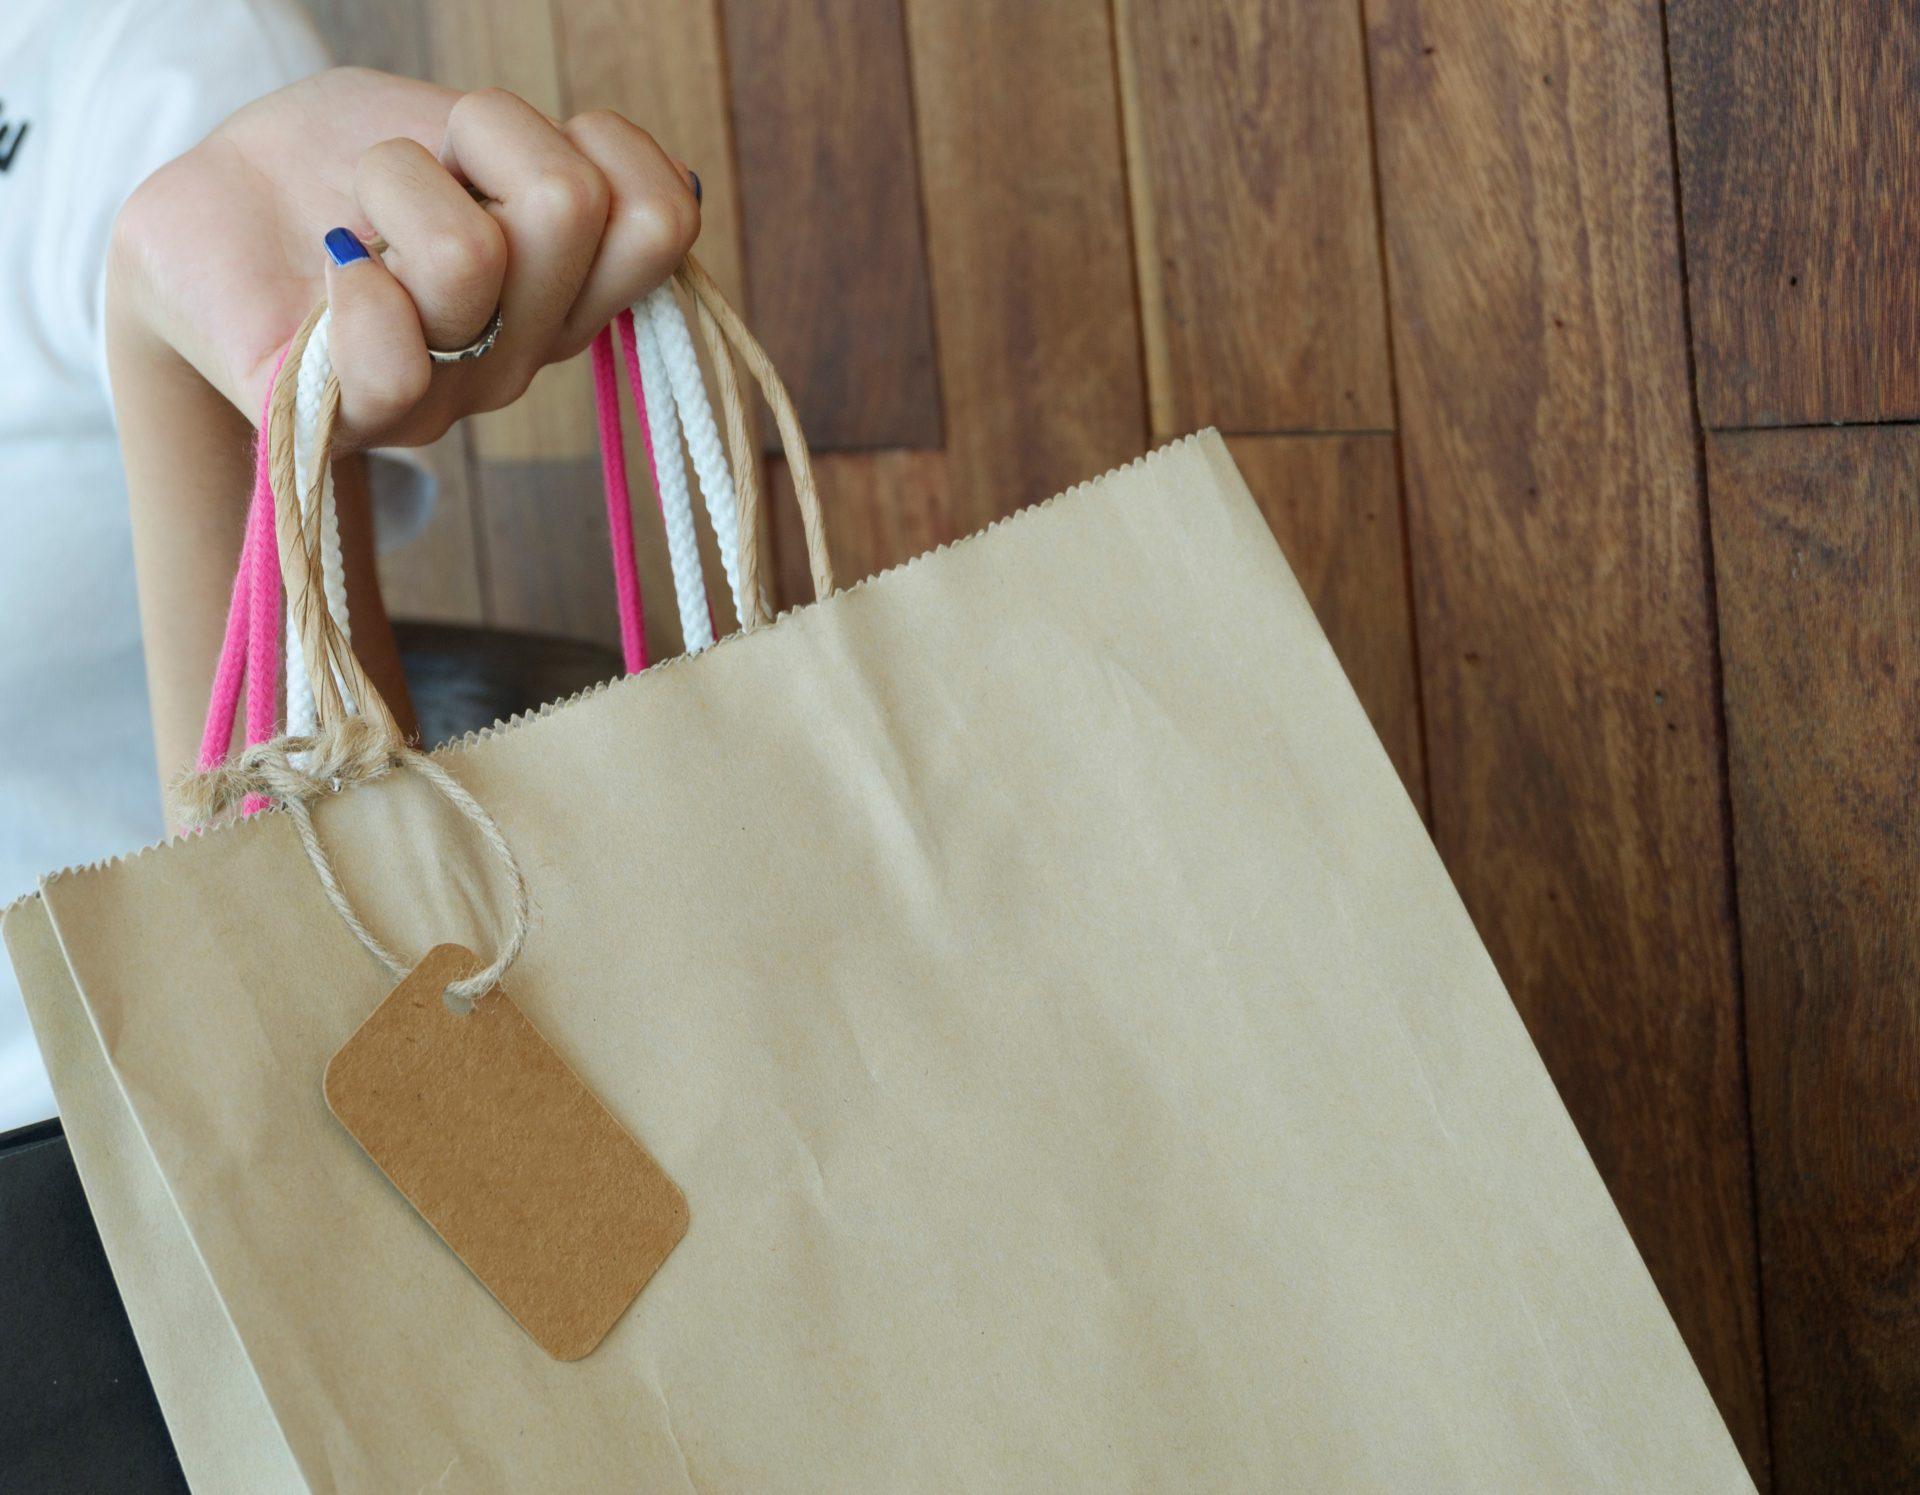 Retail tech or mainstream shopping